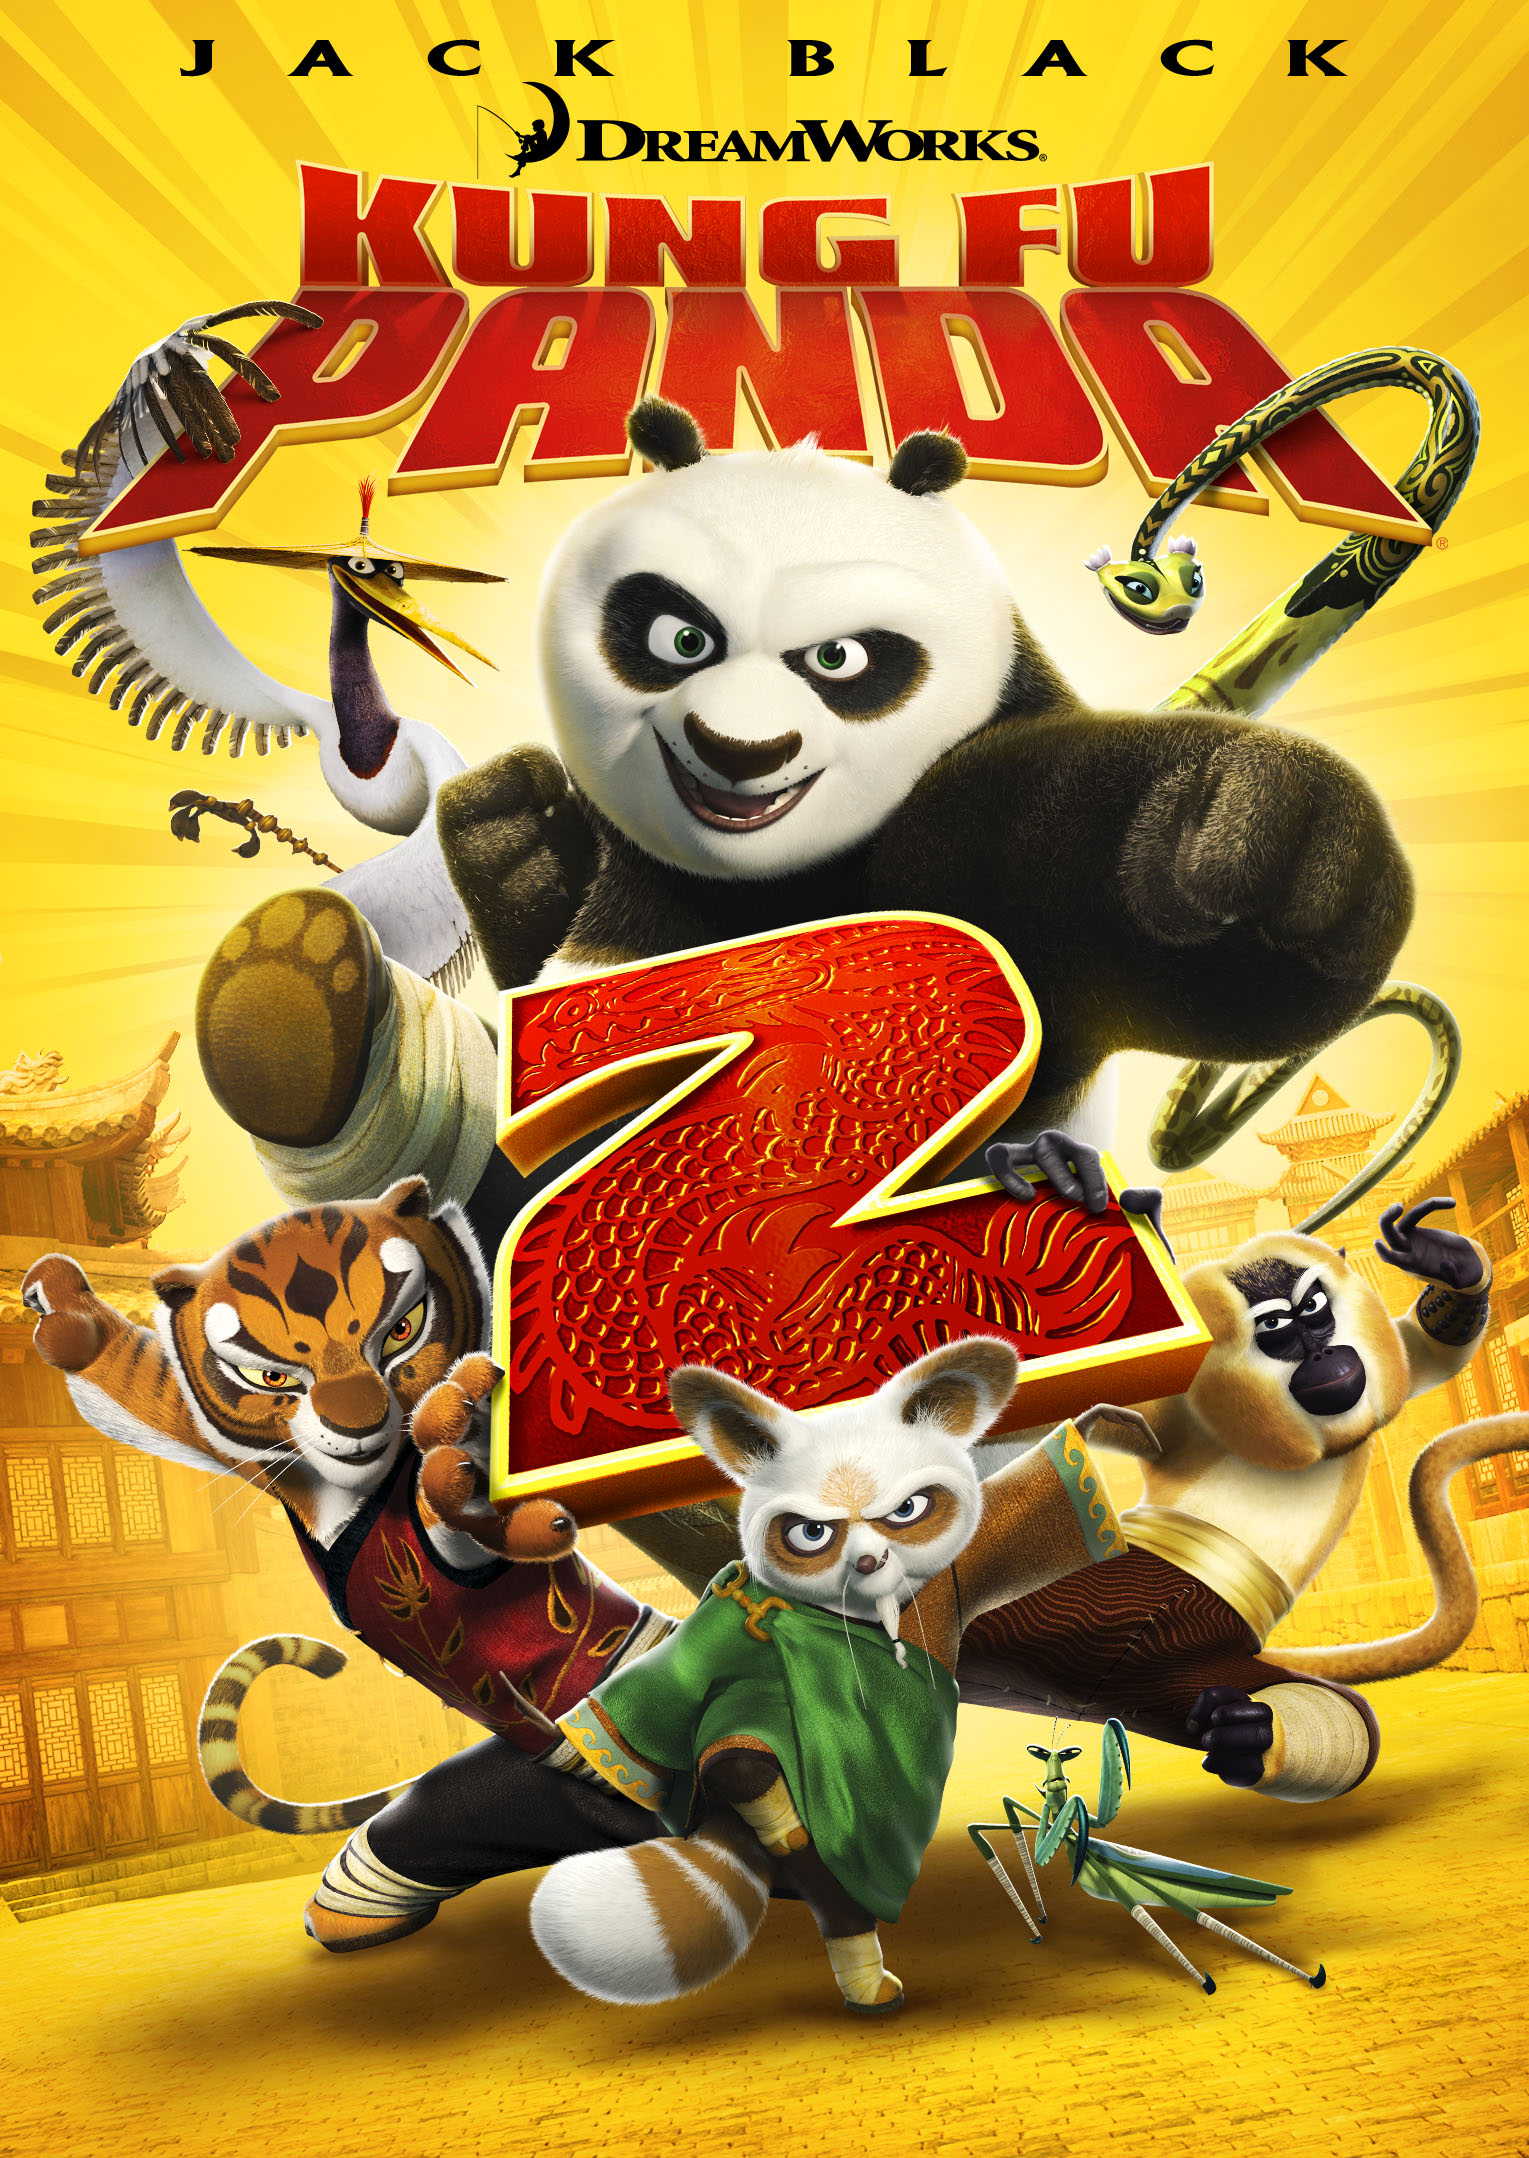 Kung Fu Panda 2 Wallpapers Movie Hq Kung Fu Panda 2 Pictures